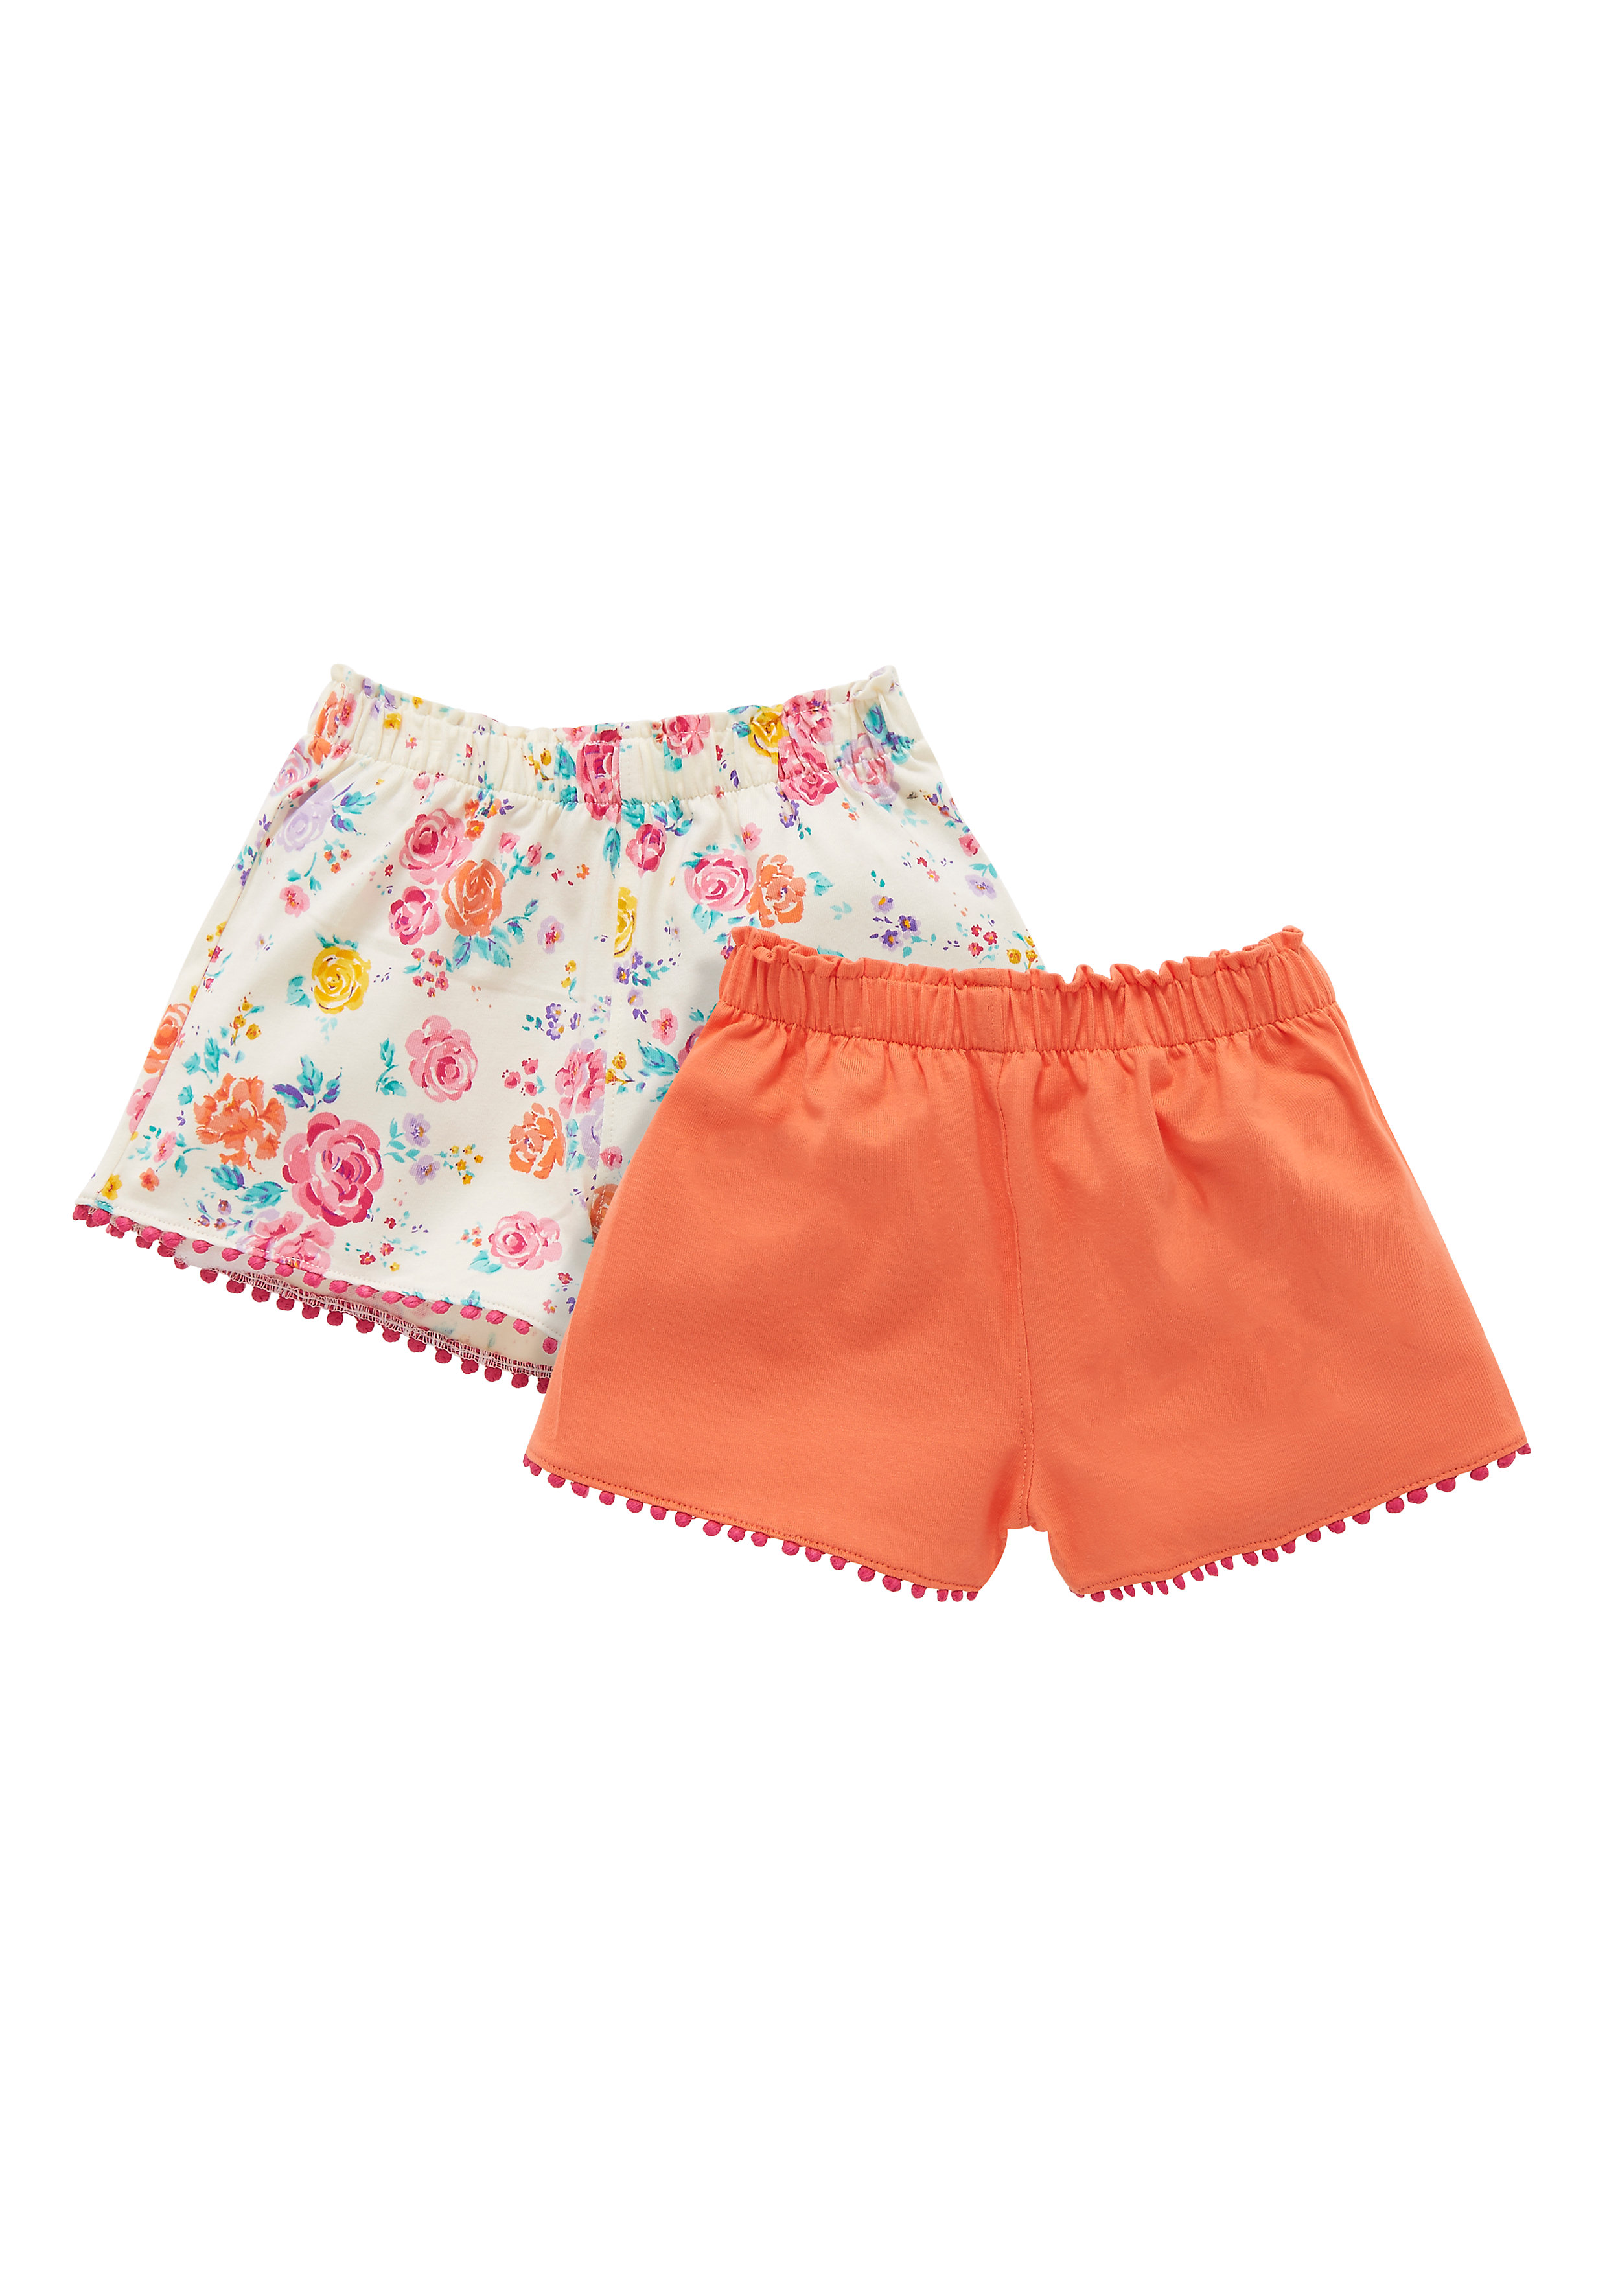 Mothercare | Girls Jersey Shorts - 2 Pack - Orange